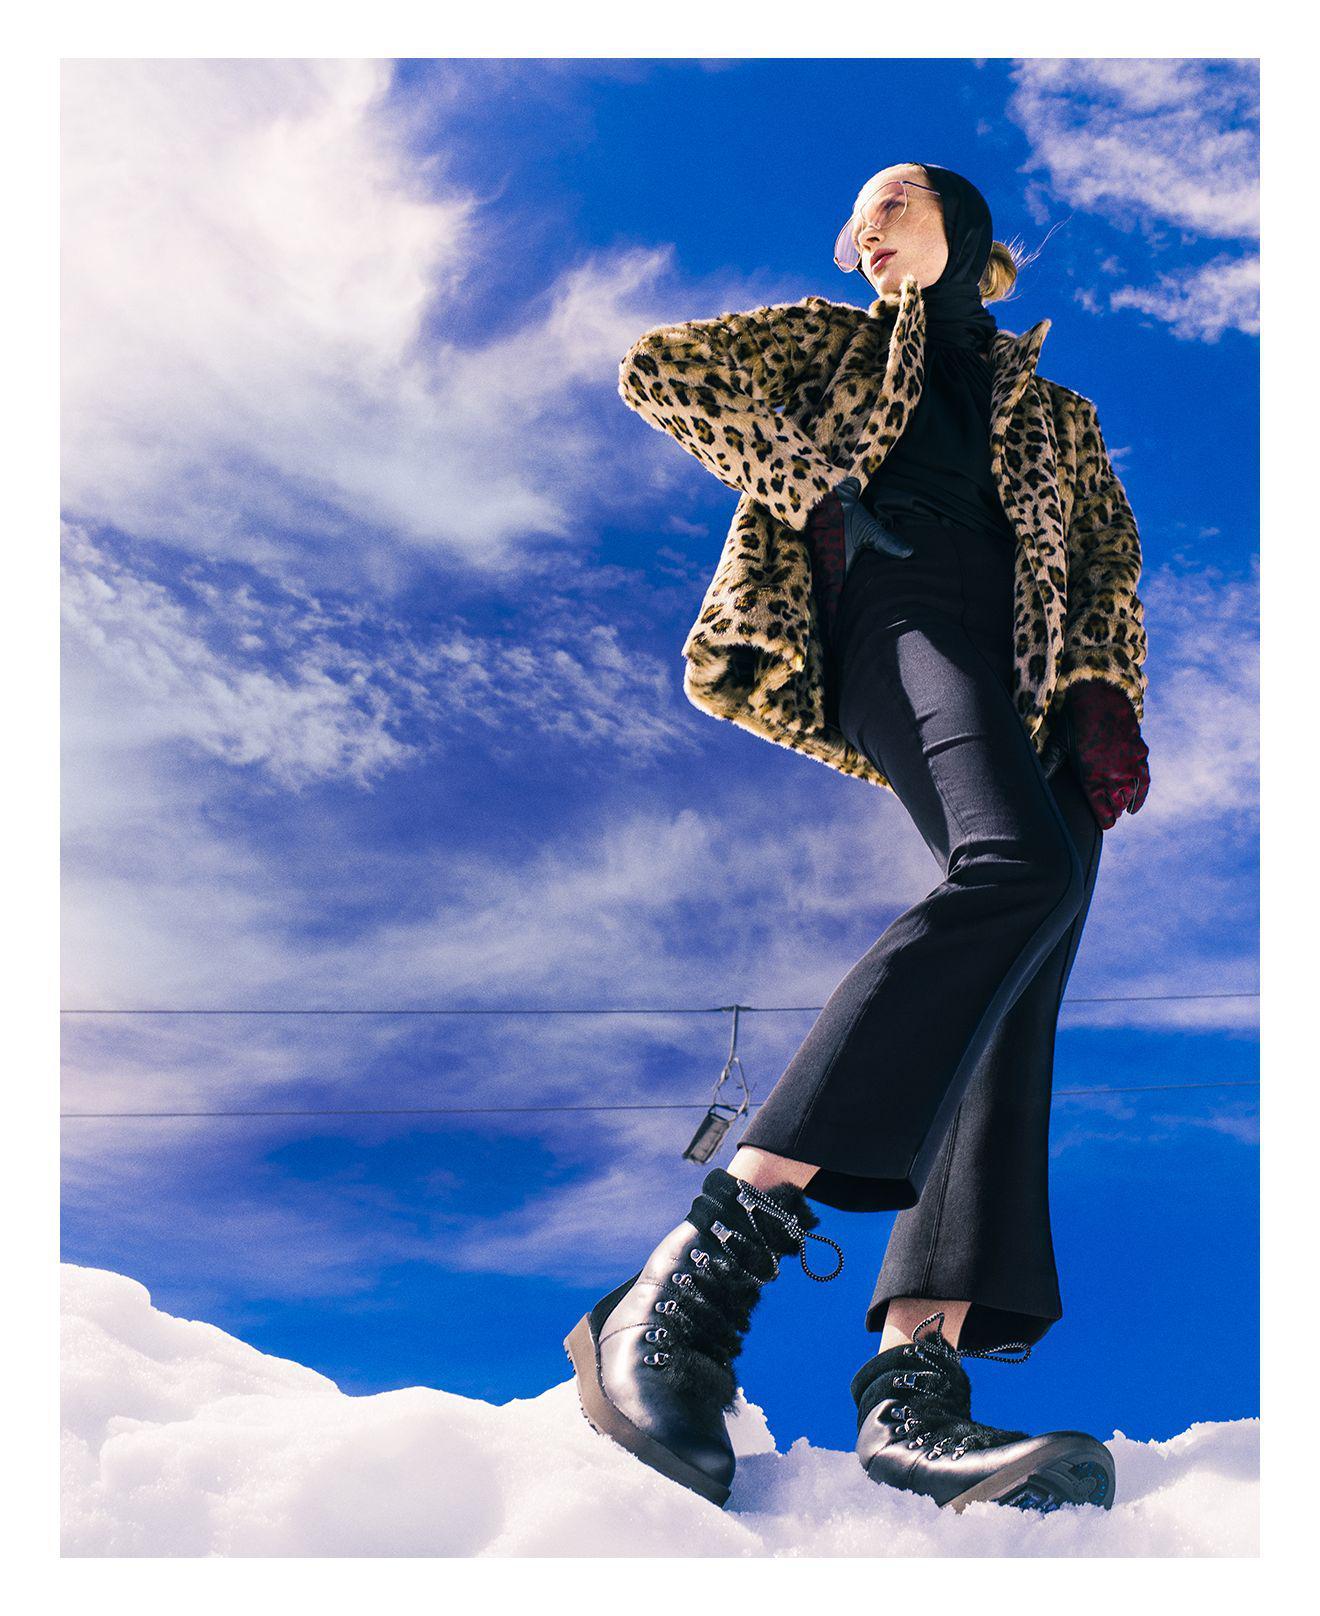 dc719560248 Ugg Brown Viki Waterproof Leather & Sheepskin Boots